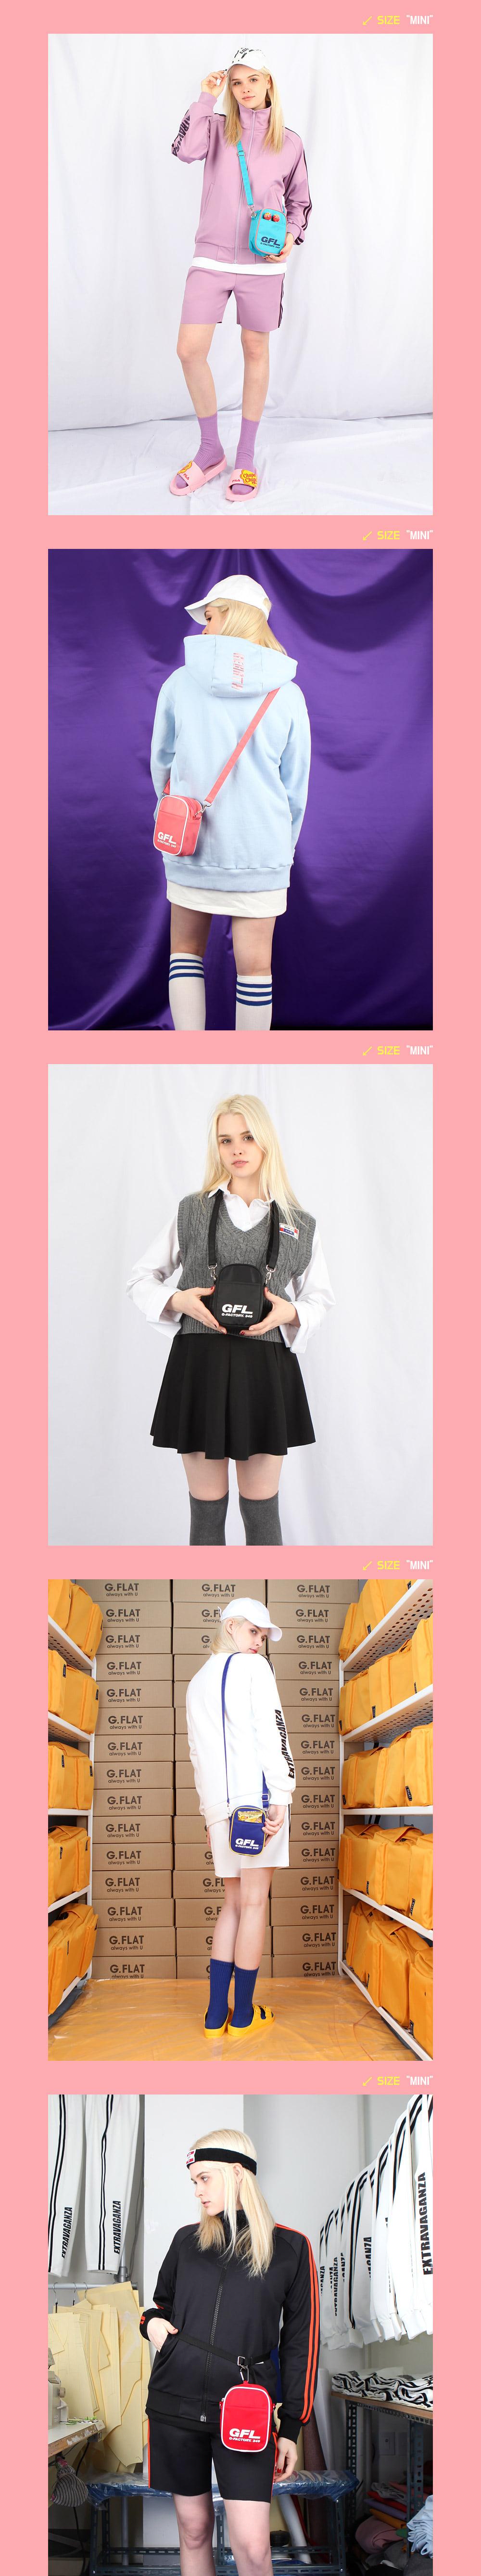 03_model_mini_01.jpg